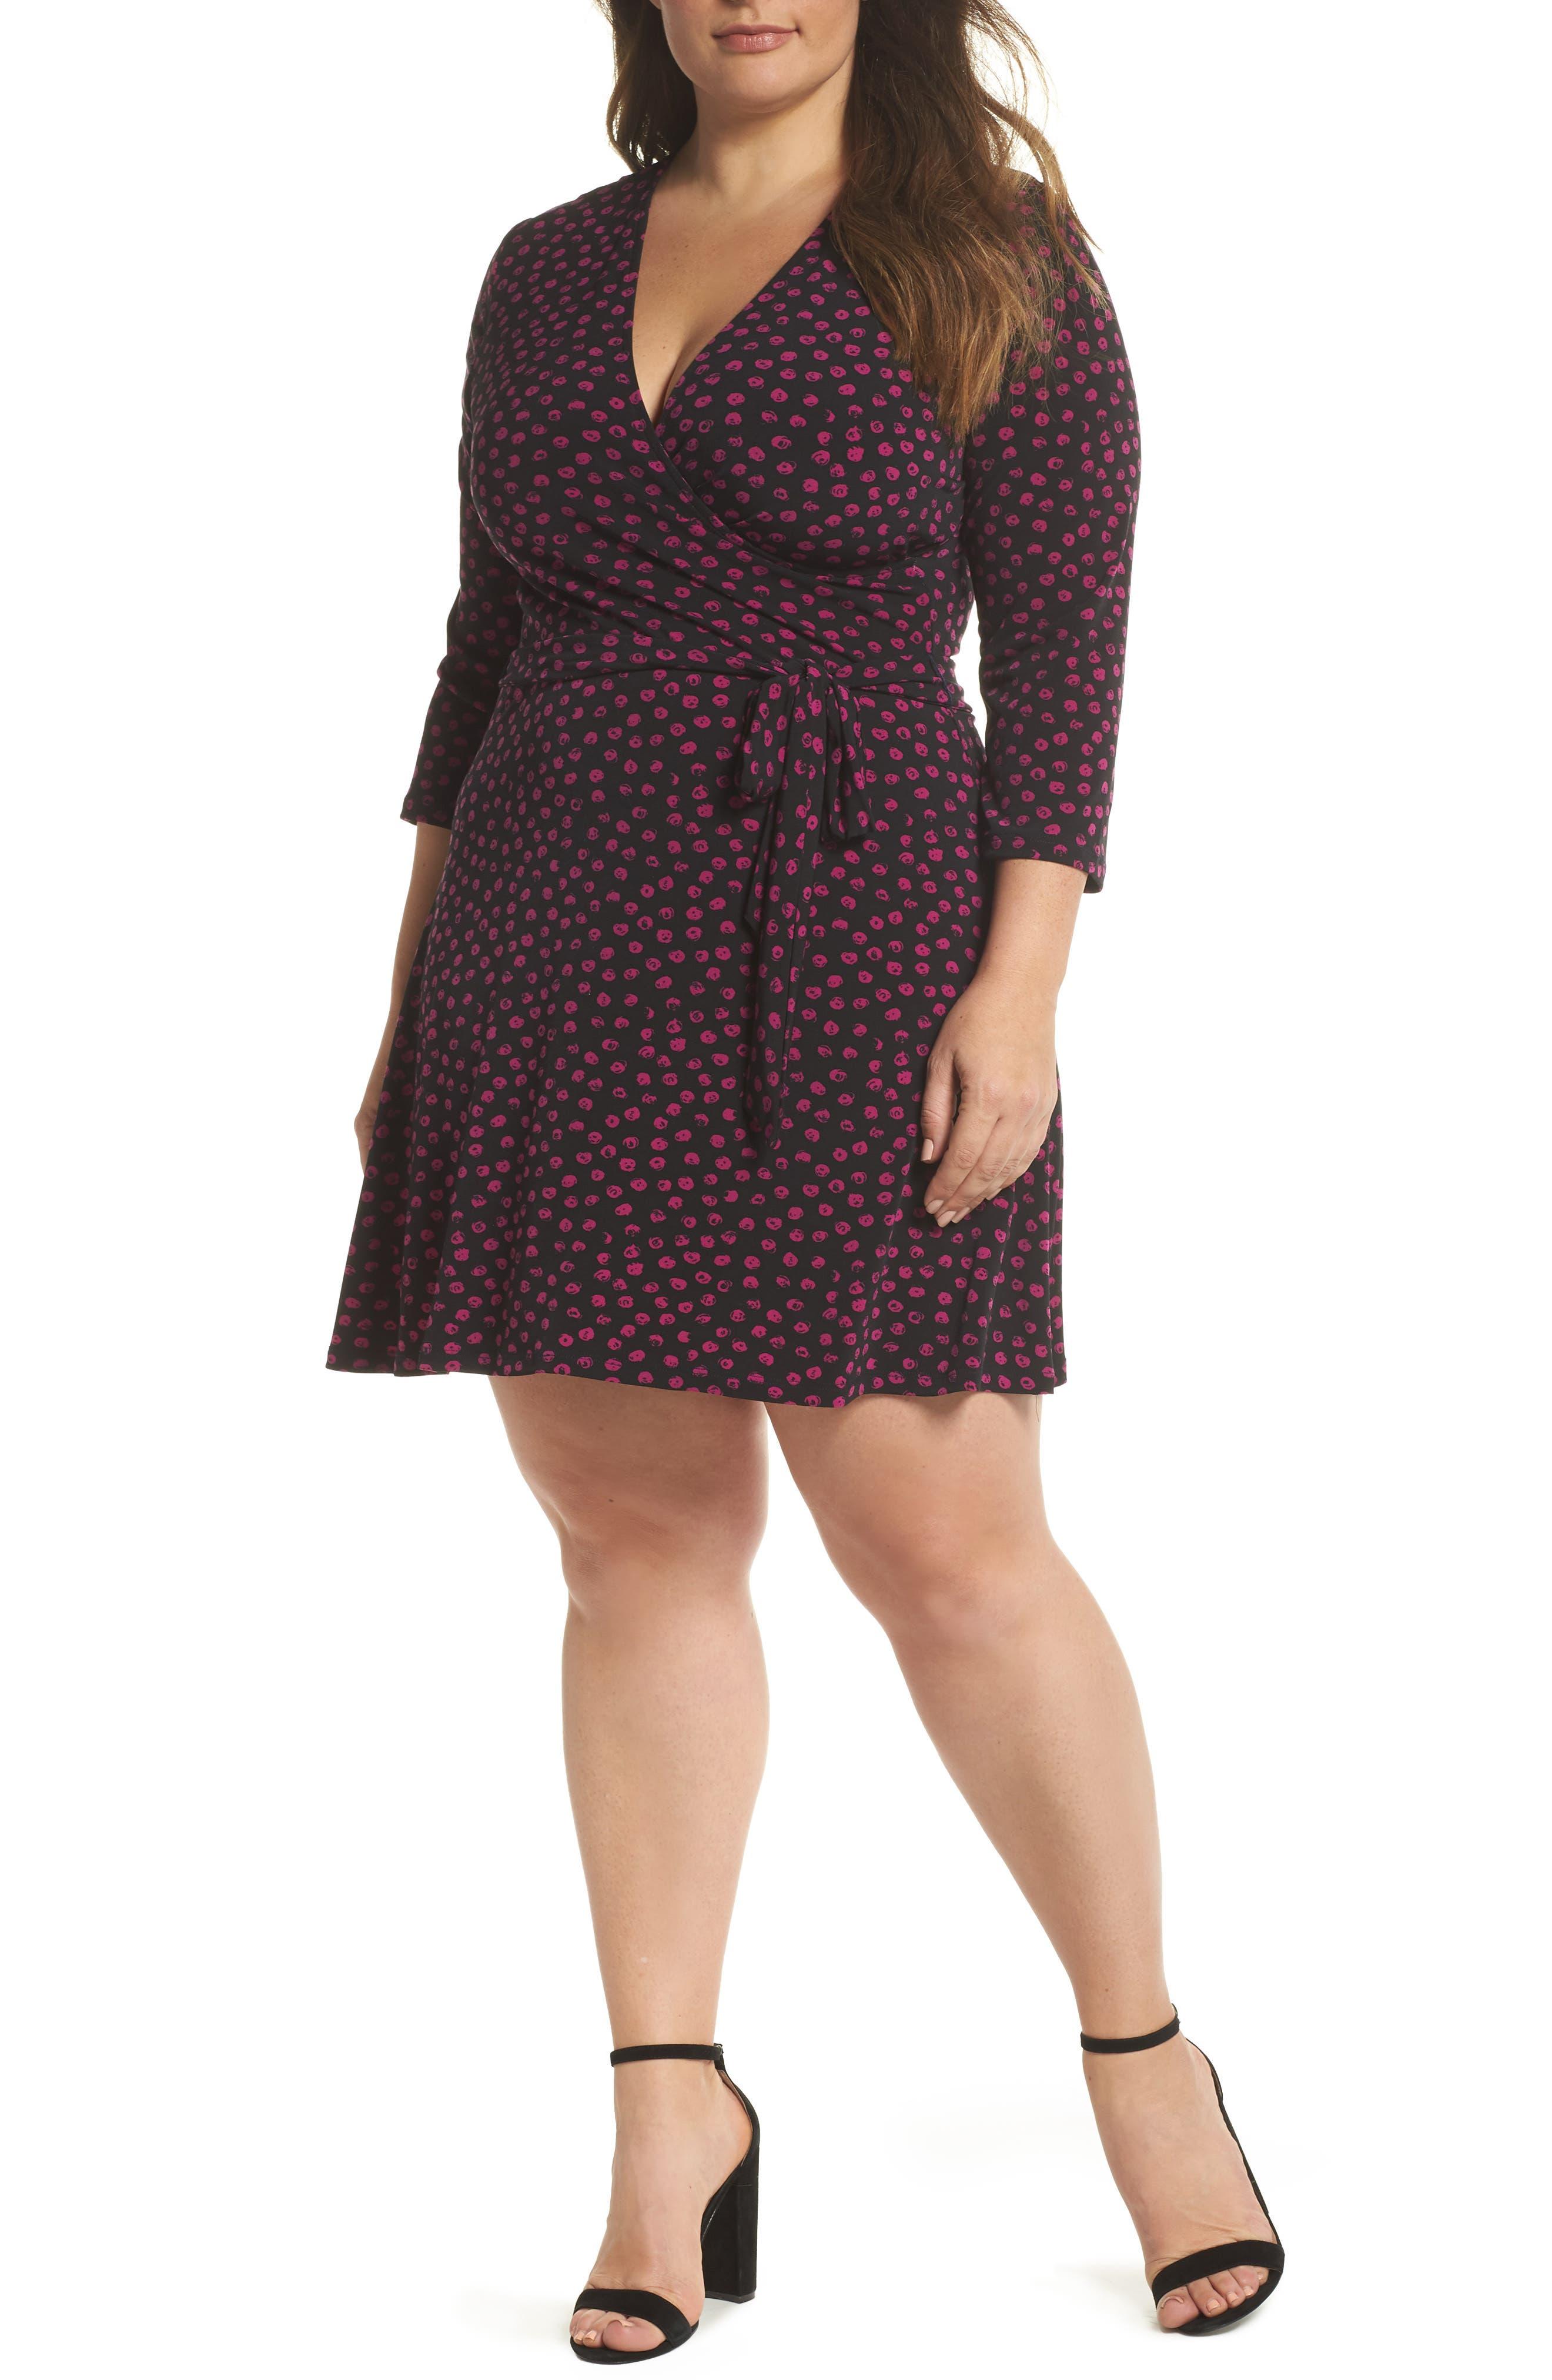 Alternate Image 1 Selected - Leota Perfect Faux Wrap Jersey Dress (Plus Size)